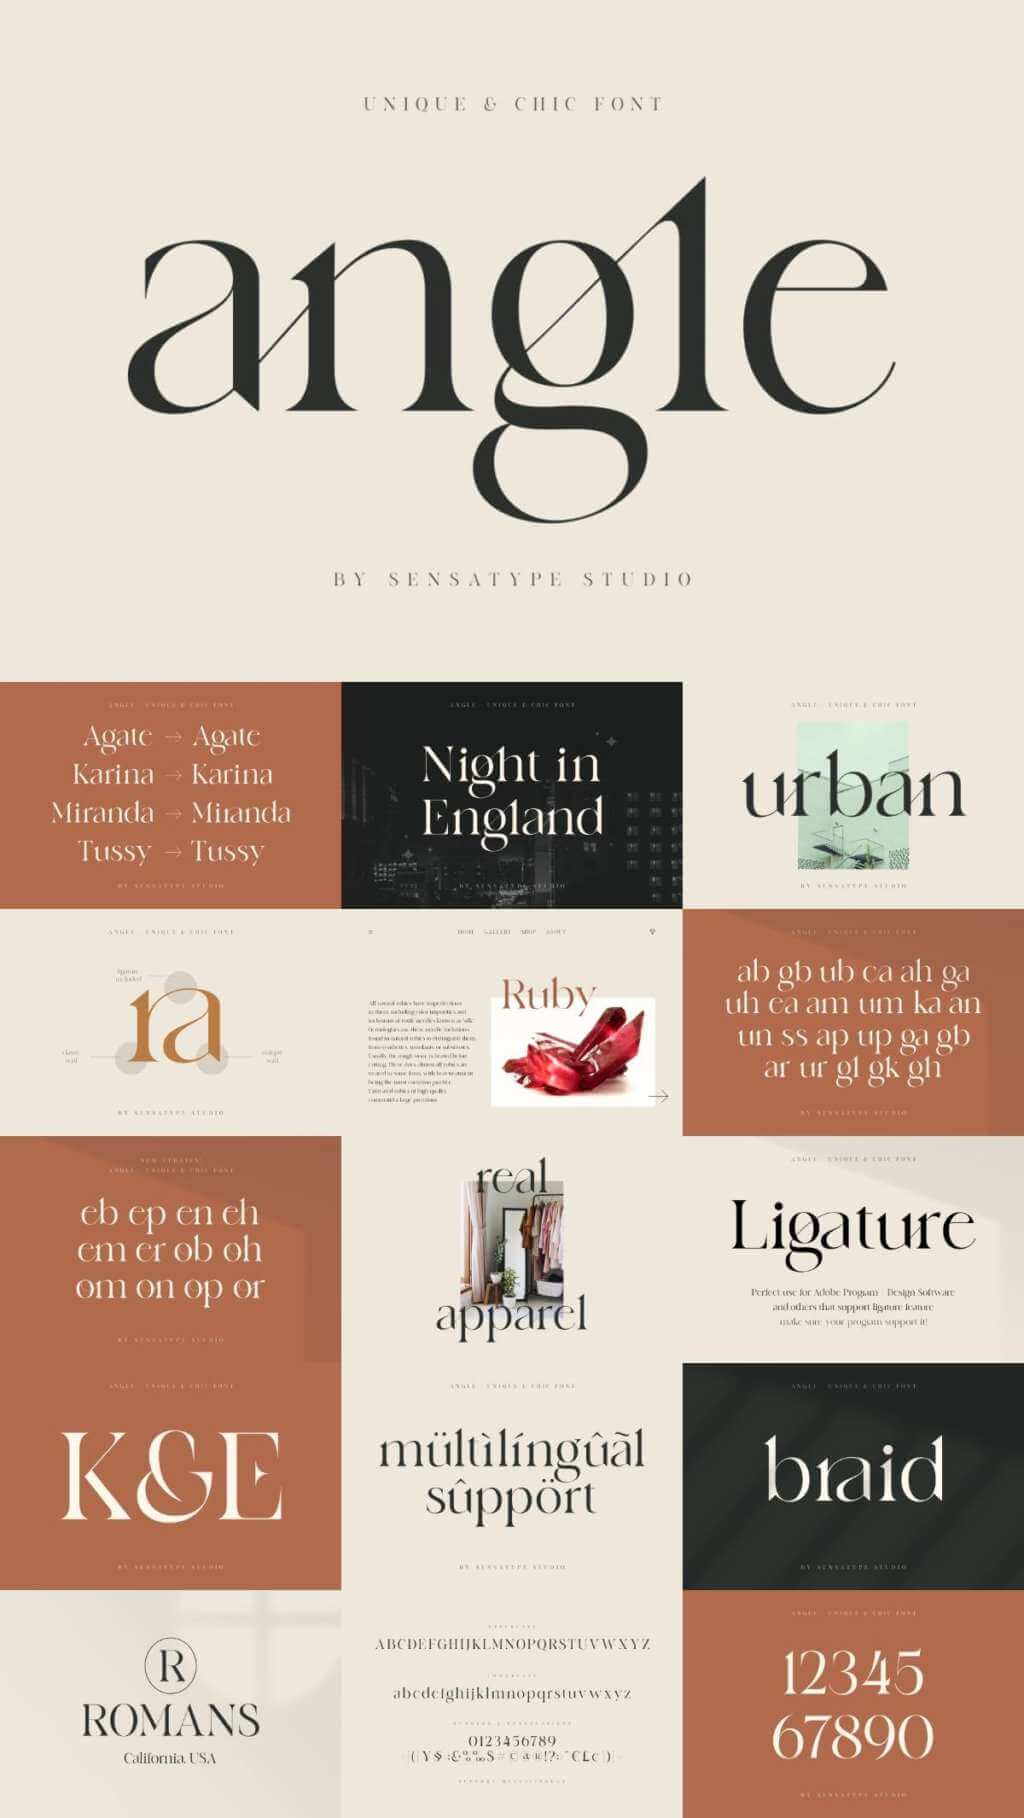 ANGLE – UNIQUE & CHIC FONT